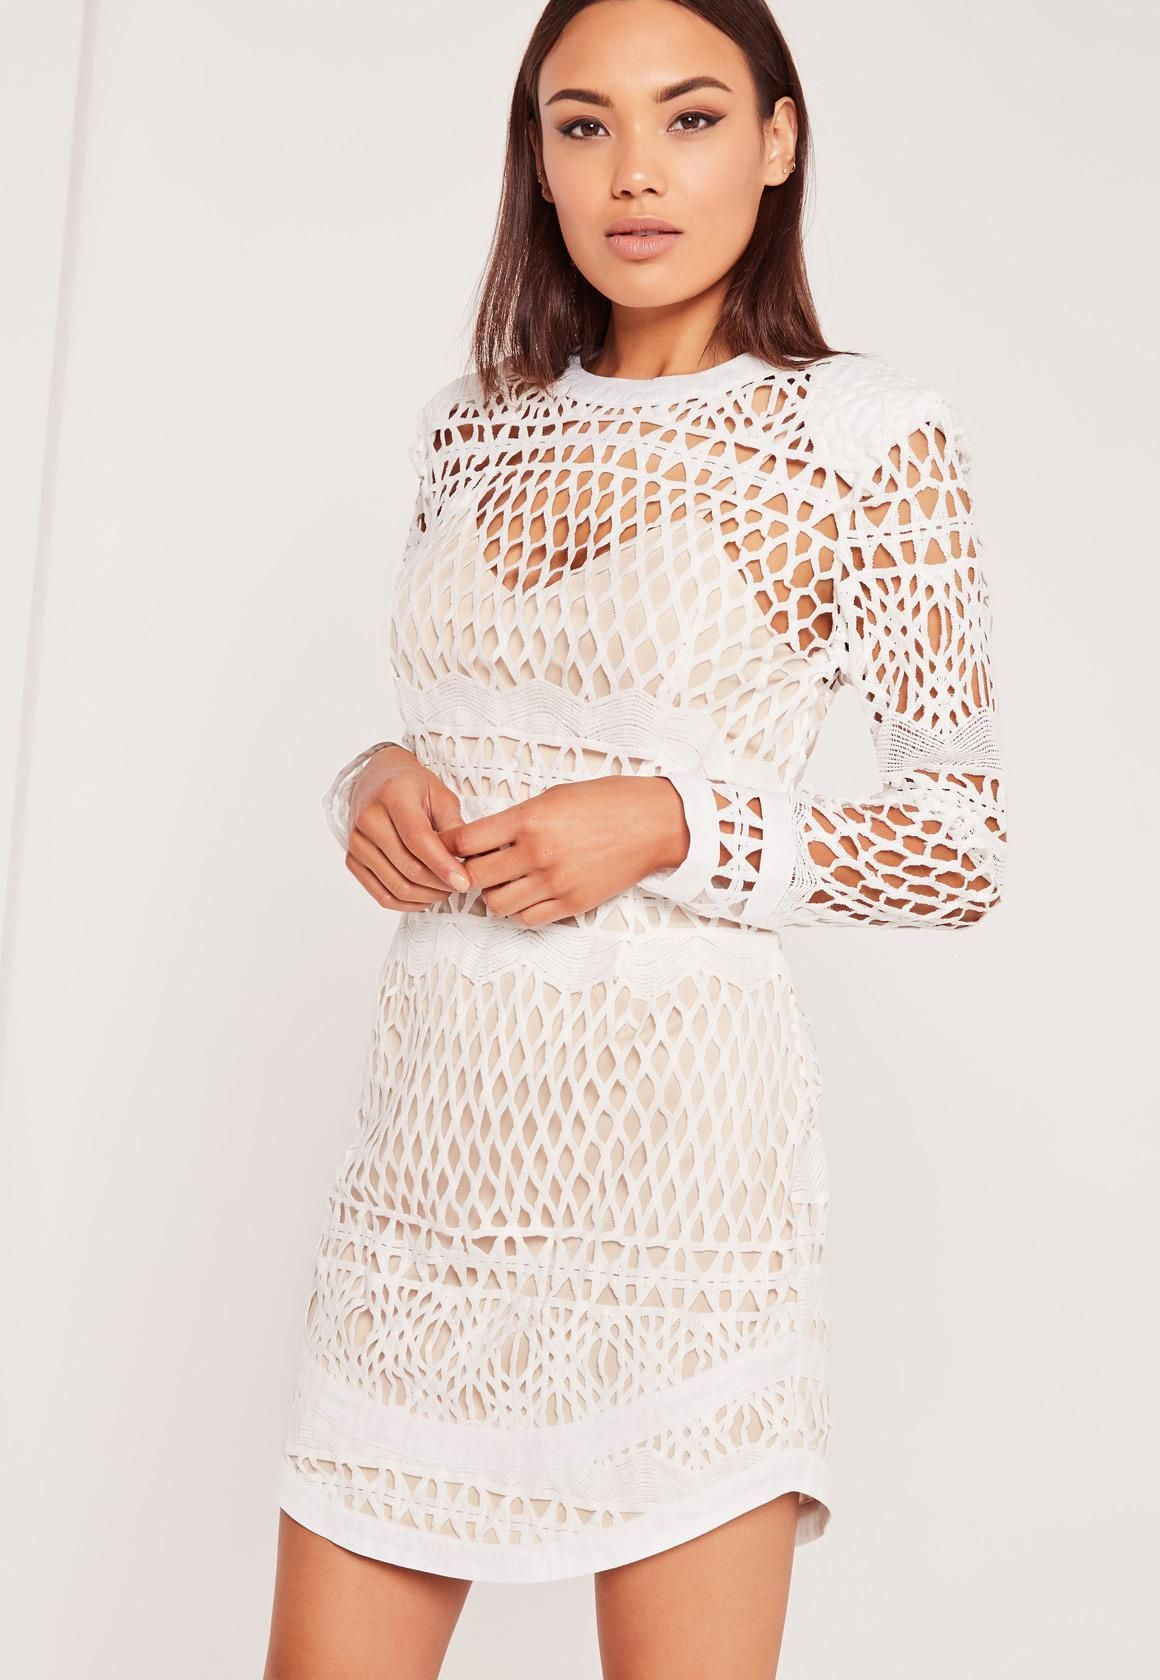 Long Sleeve Lace Bodycon Dress White Missguided Women Dress Online Sleeveless Mini Dress Lace Bodycon Dress Long Sleeve [ 1680 x 1160 Pixel ]